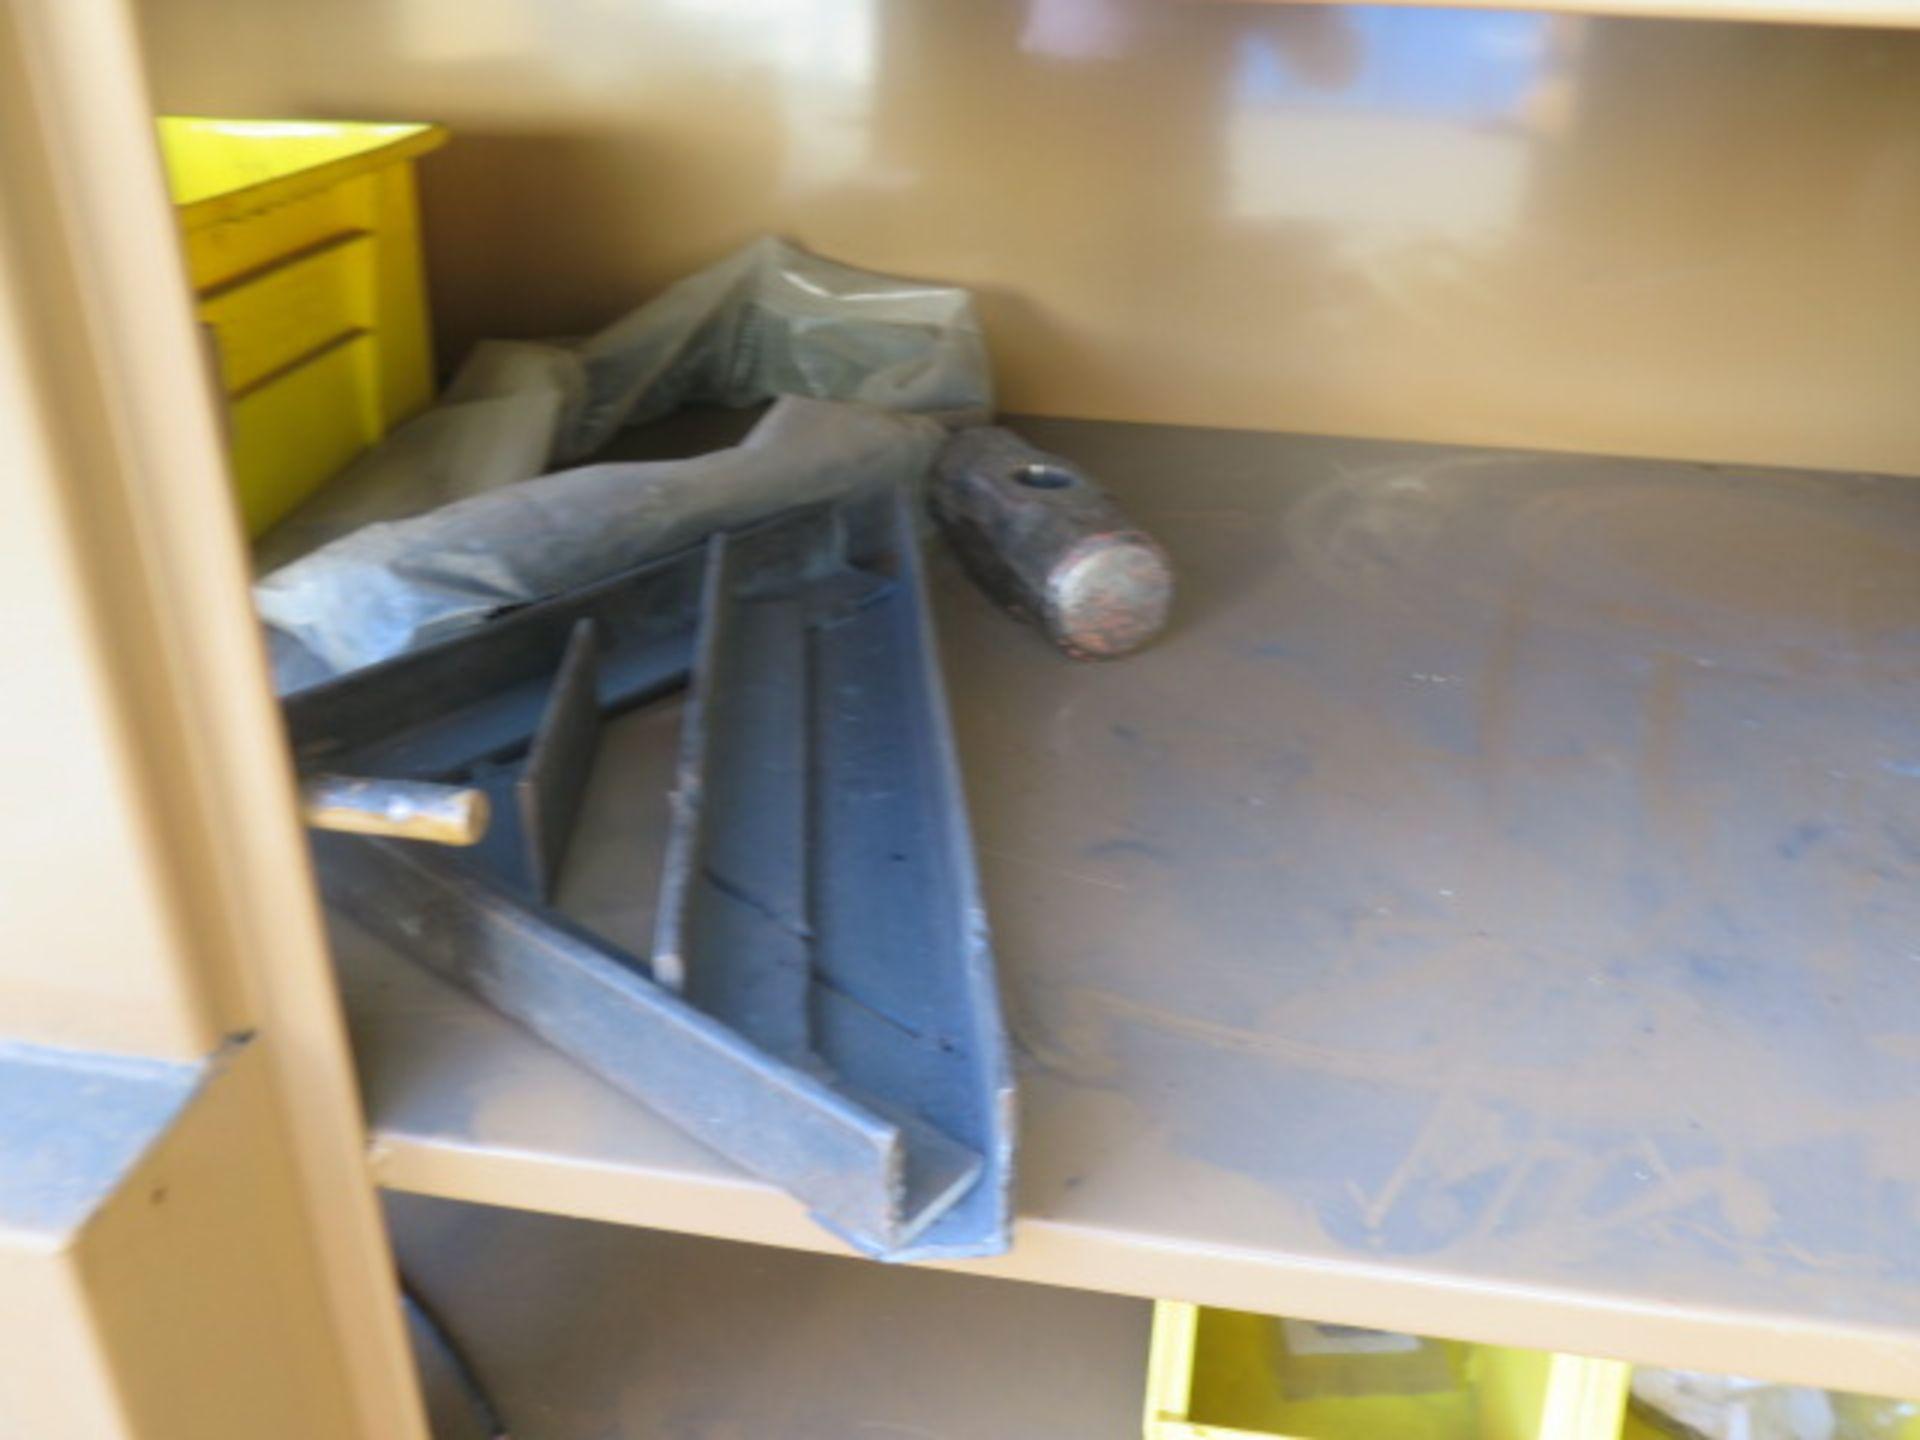 Knaack mdl. 139 Jobmaster Job Box (SOLD AS-IS - NO WARRANTY) - Image 7 of 17